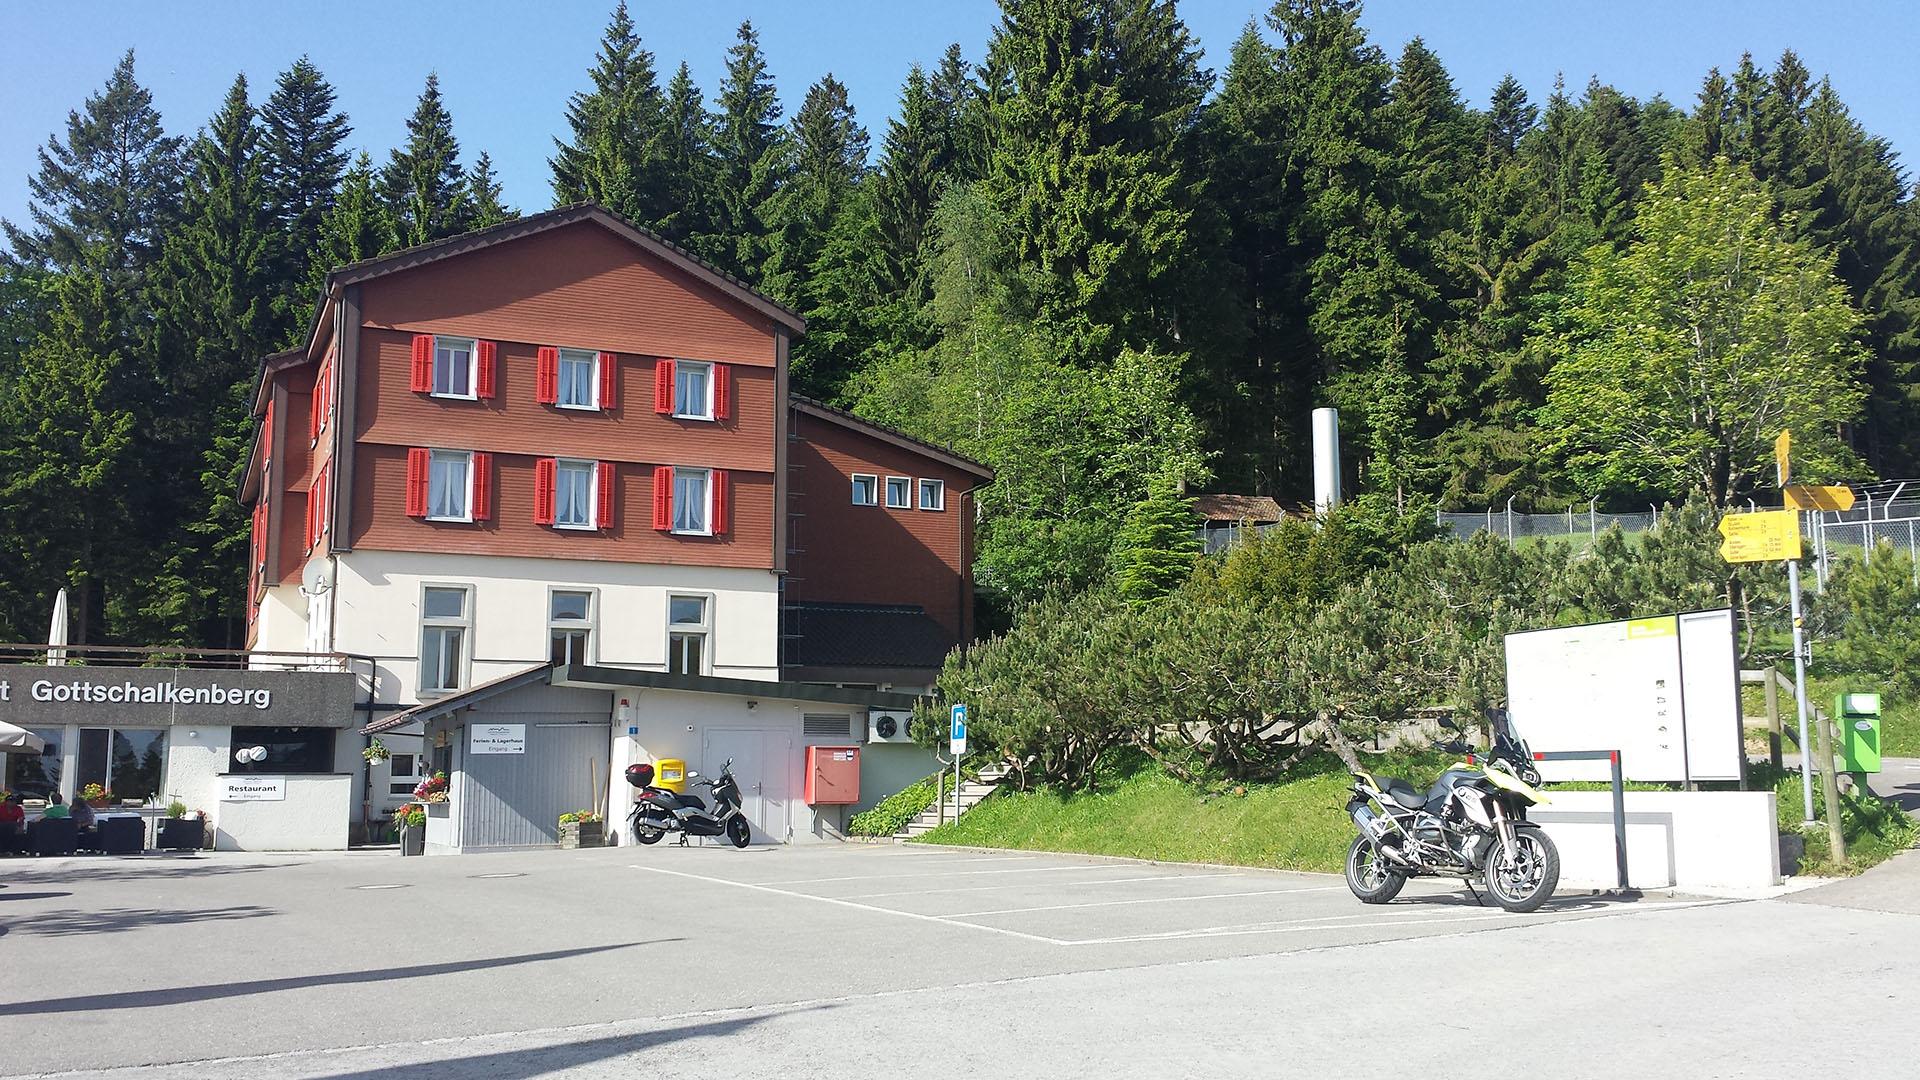 1148 - CH - Gottschalkenberg